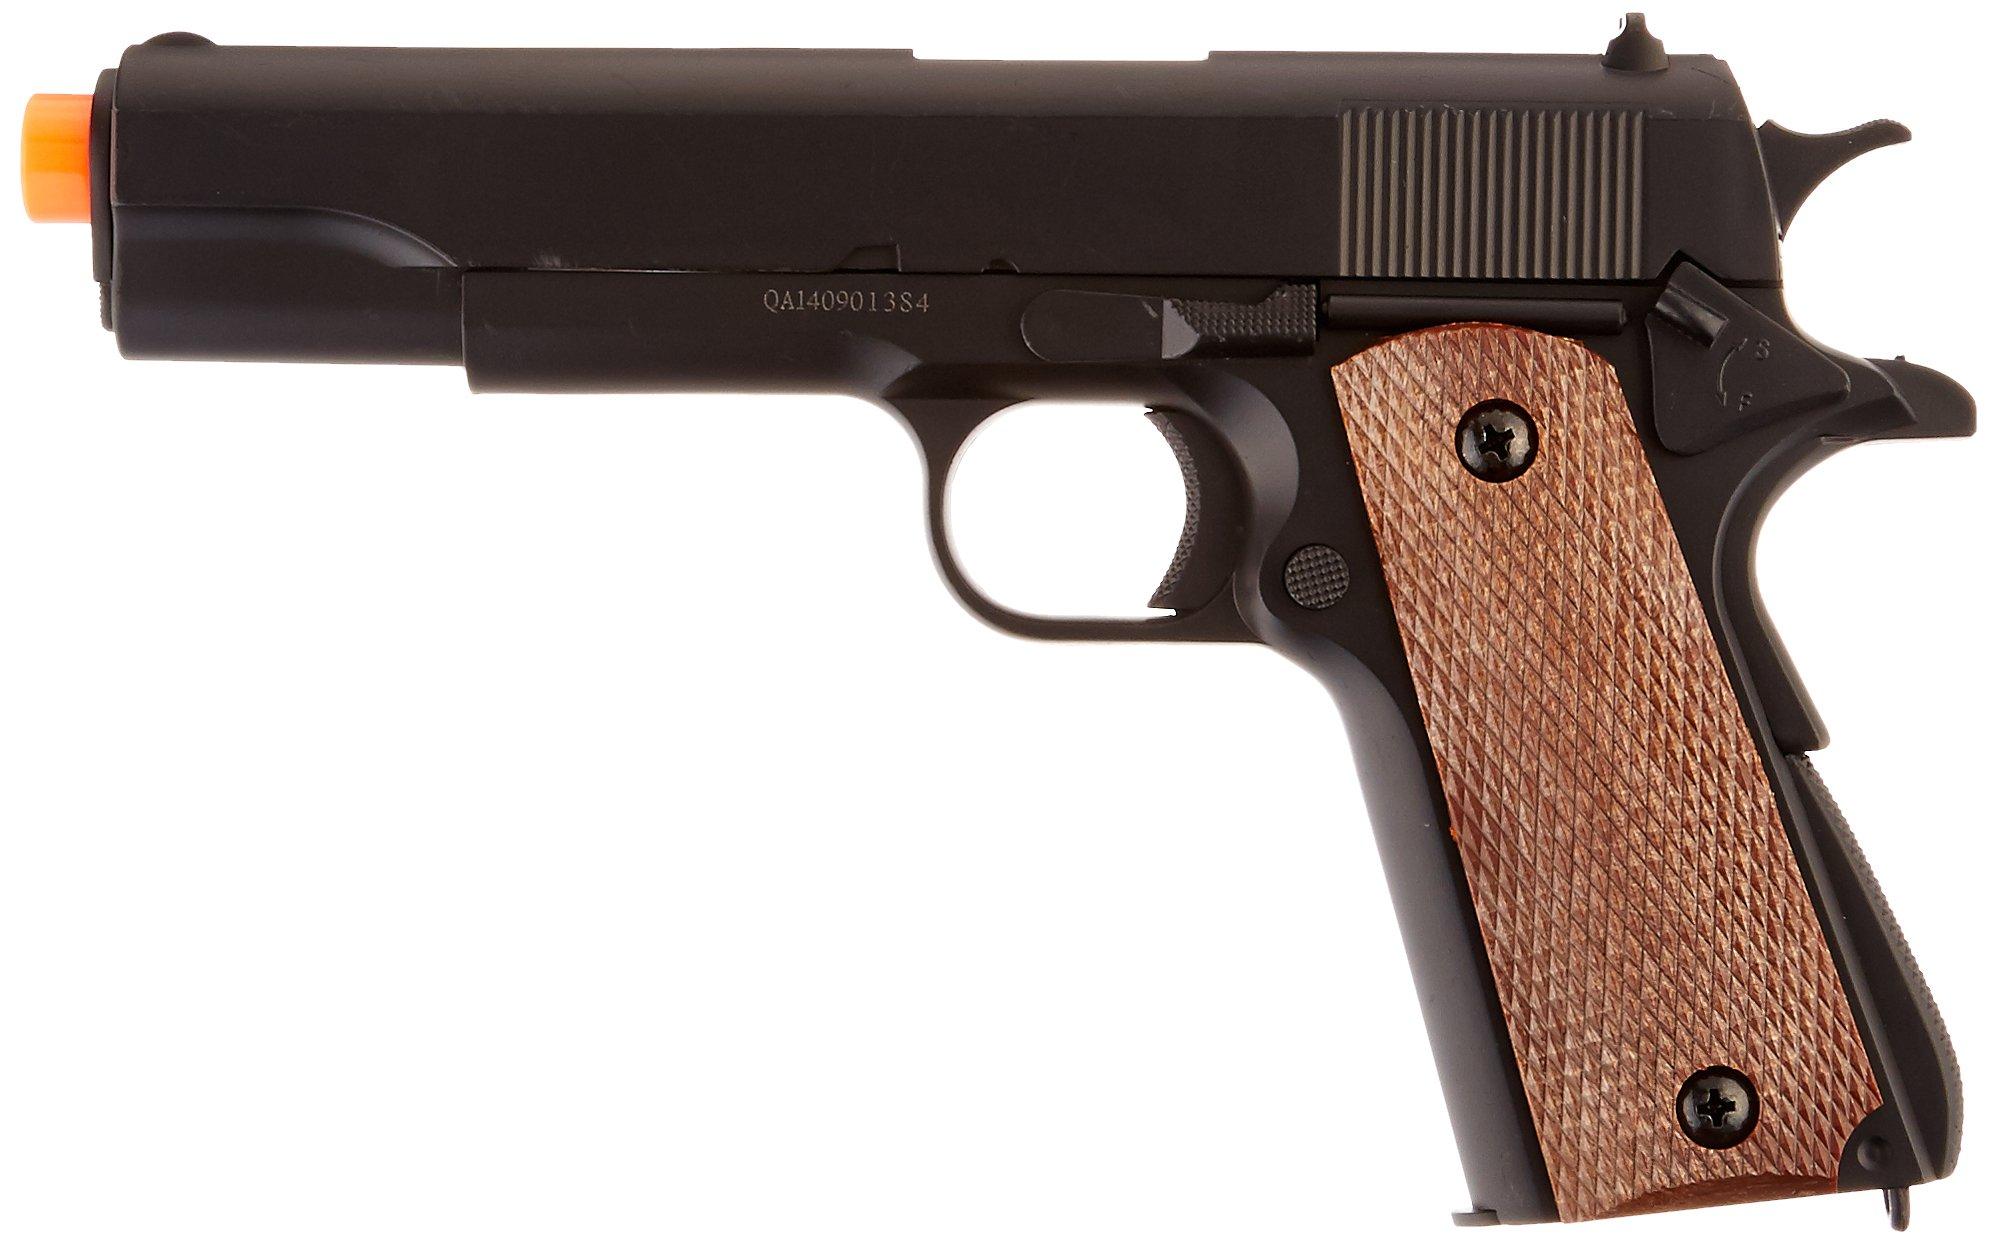 BBTac BT-1911A1 Metal and ABS Spring Airsoft Pistol 250-FPS Airsoft Gun